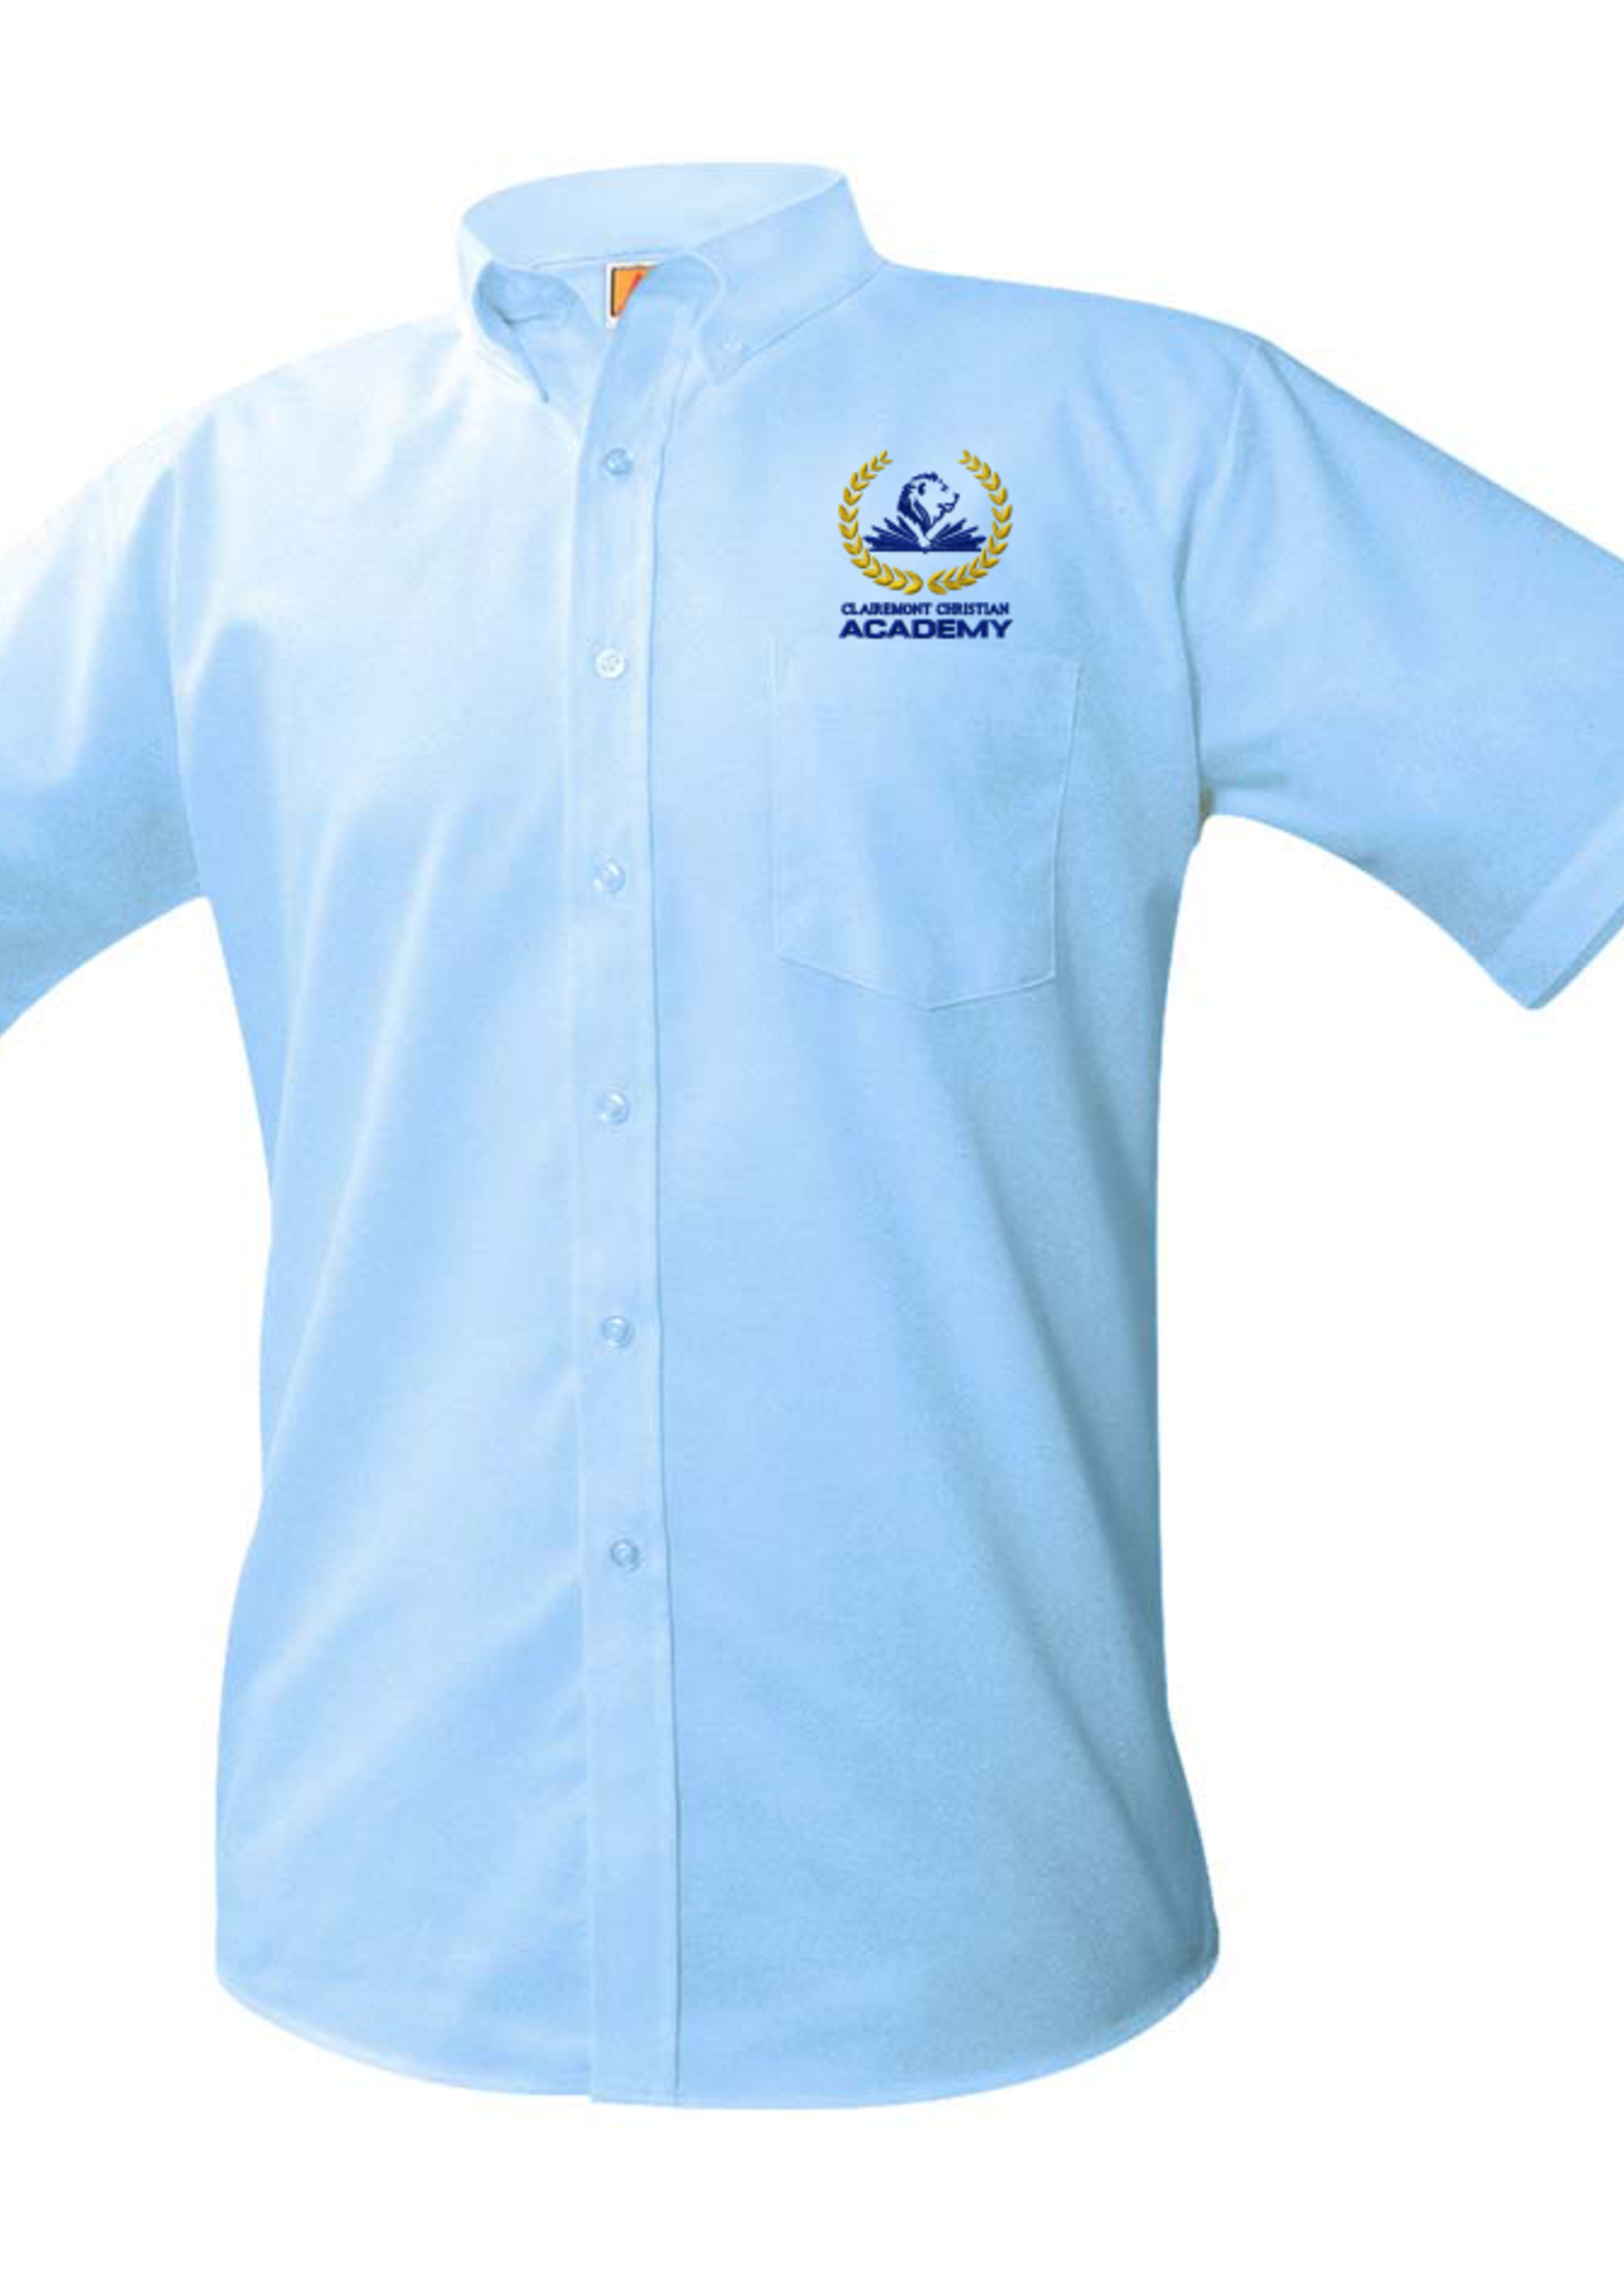 TUS ClCA Short Sleeve Oxford Shirt